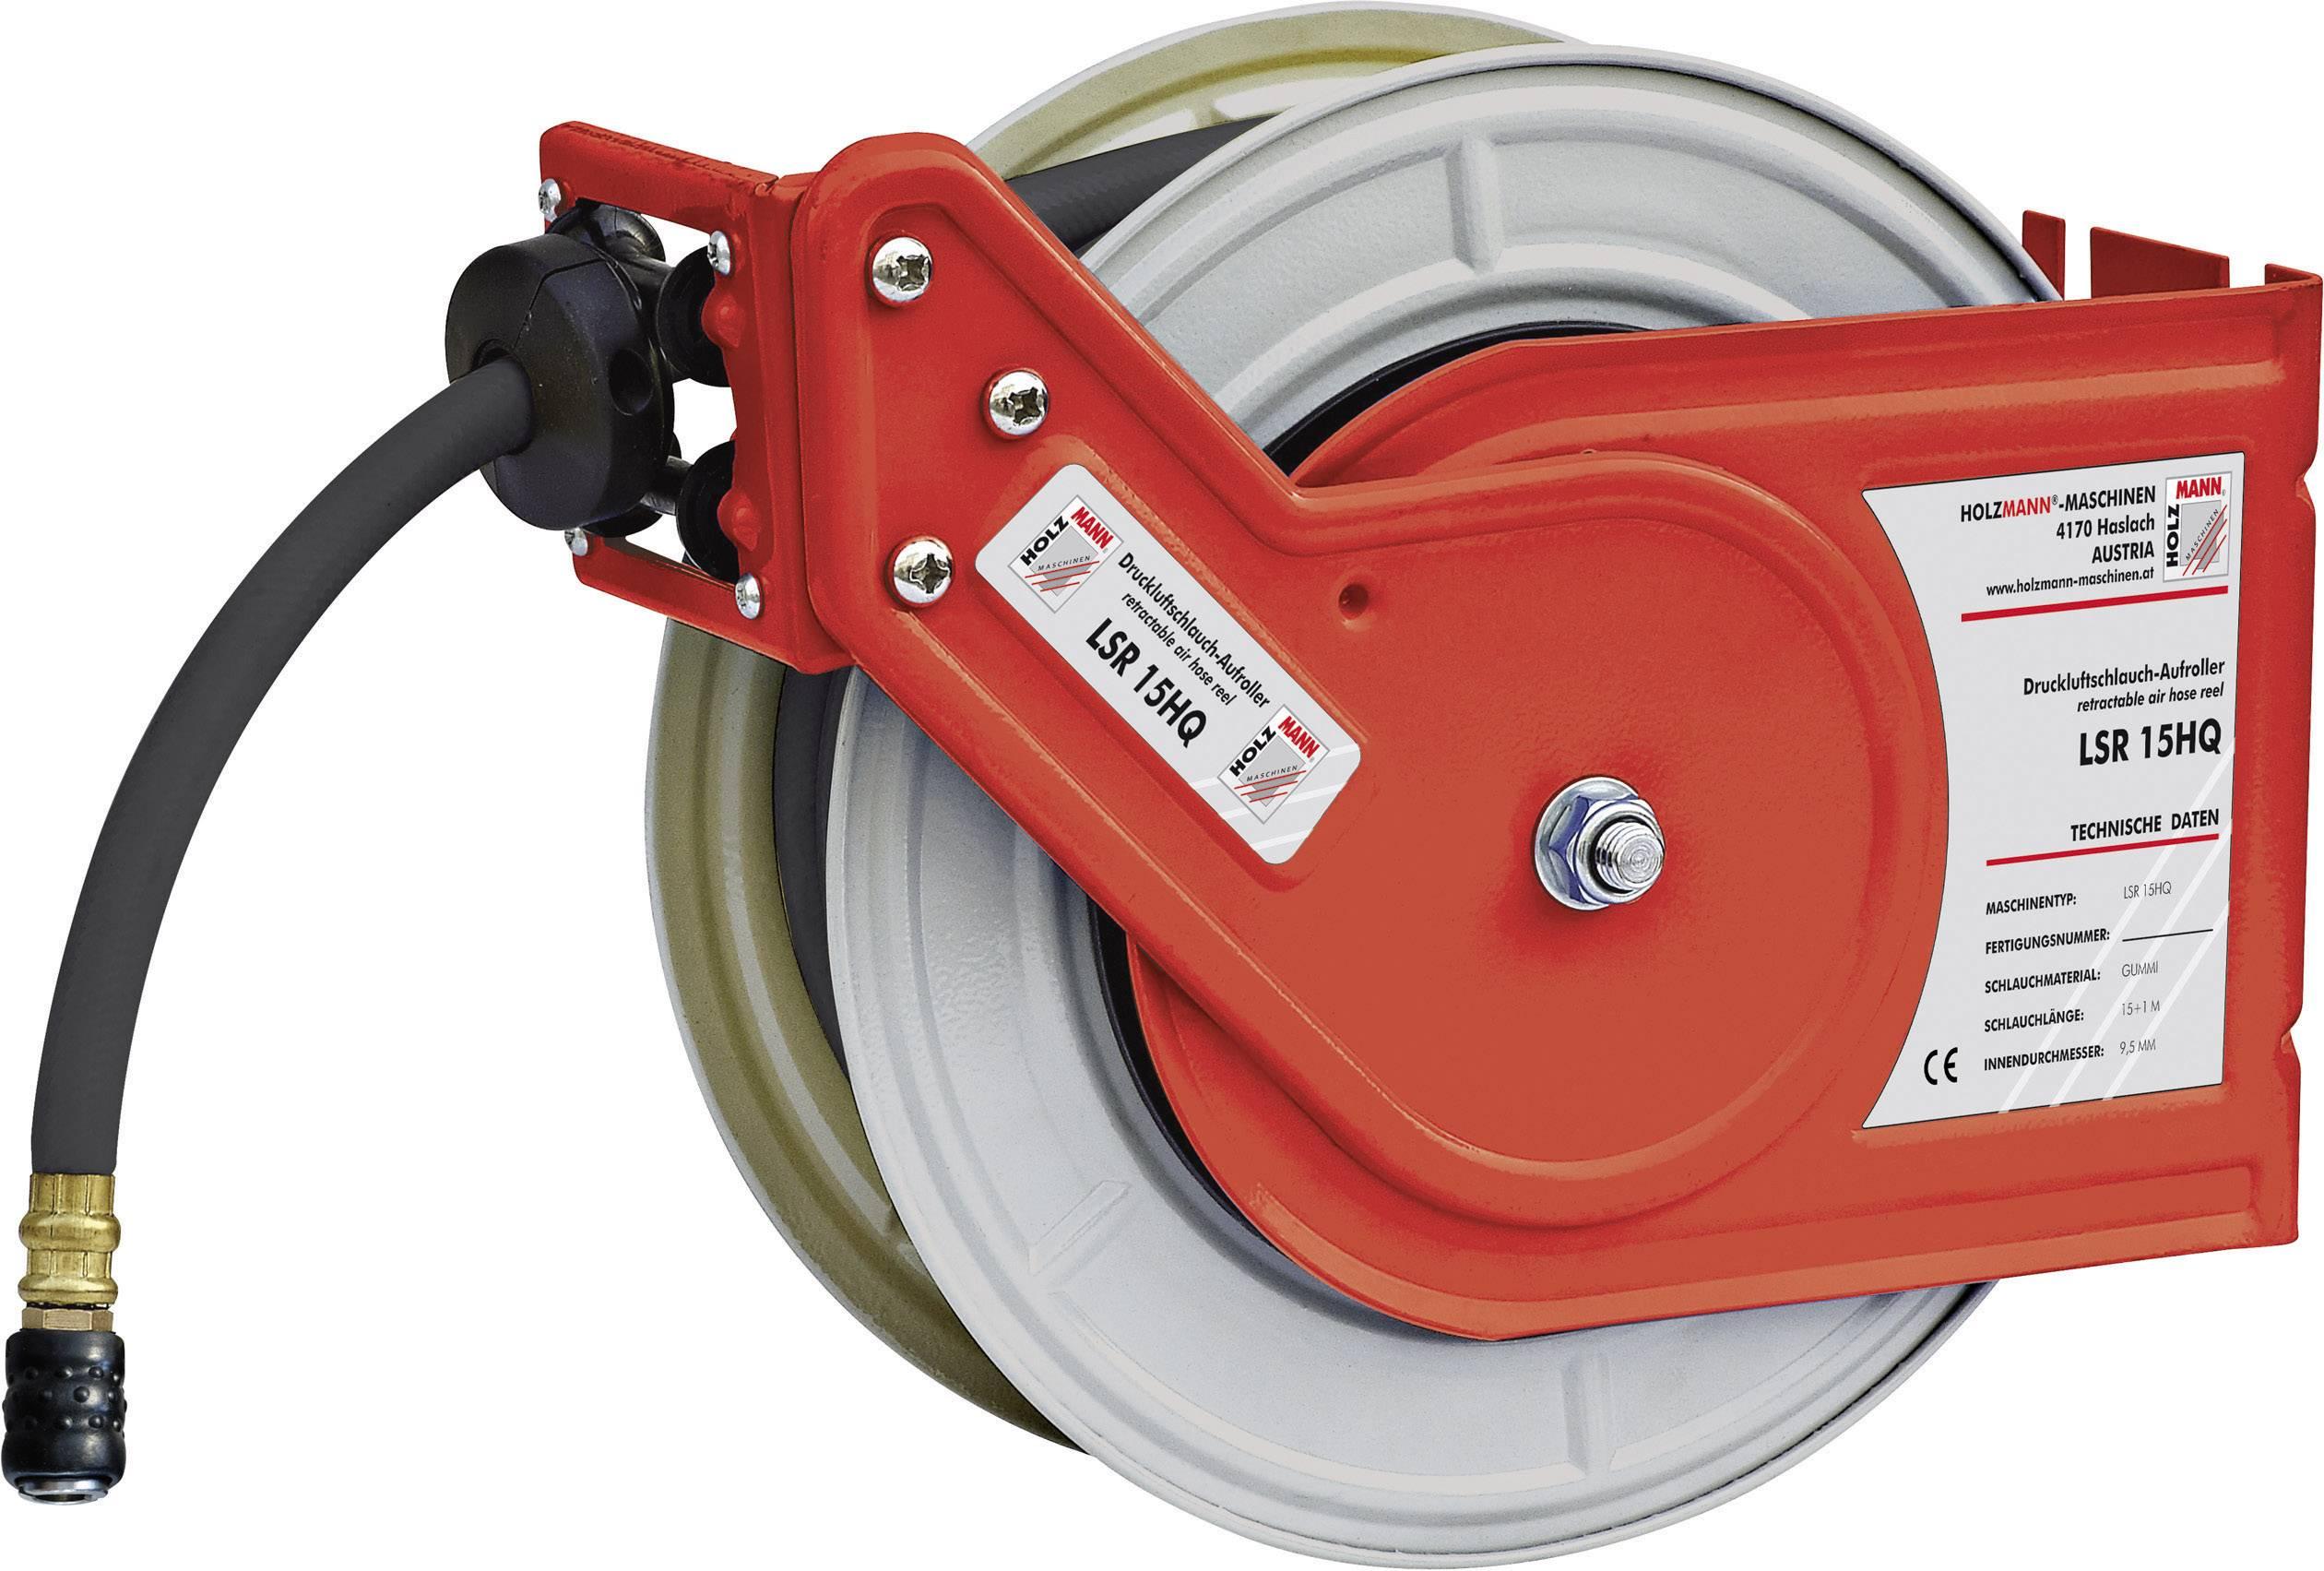 Navíjecí buben na tlakovou hadici Holzmann Maschinen LSR15HQ H050400007, 15 m